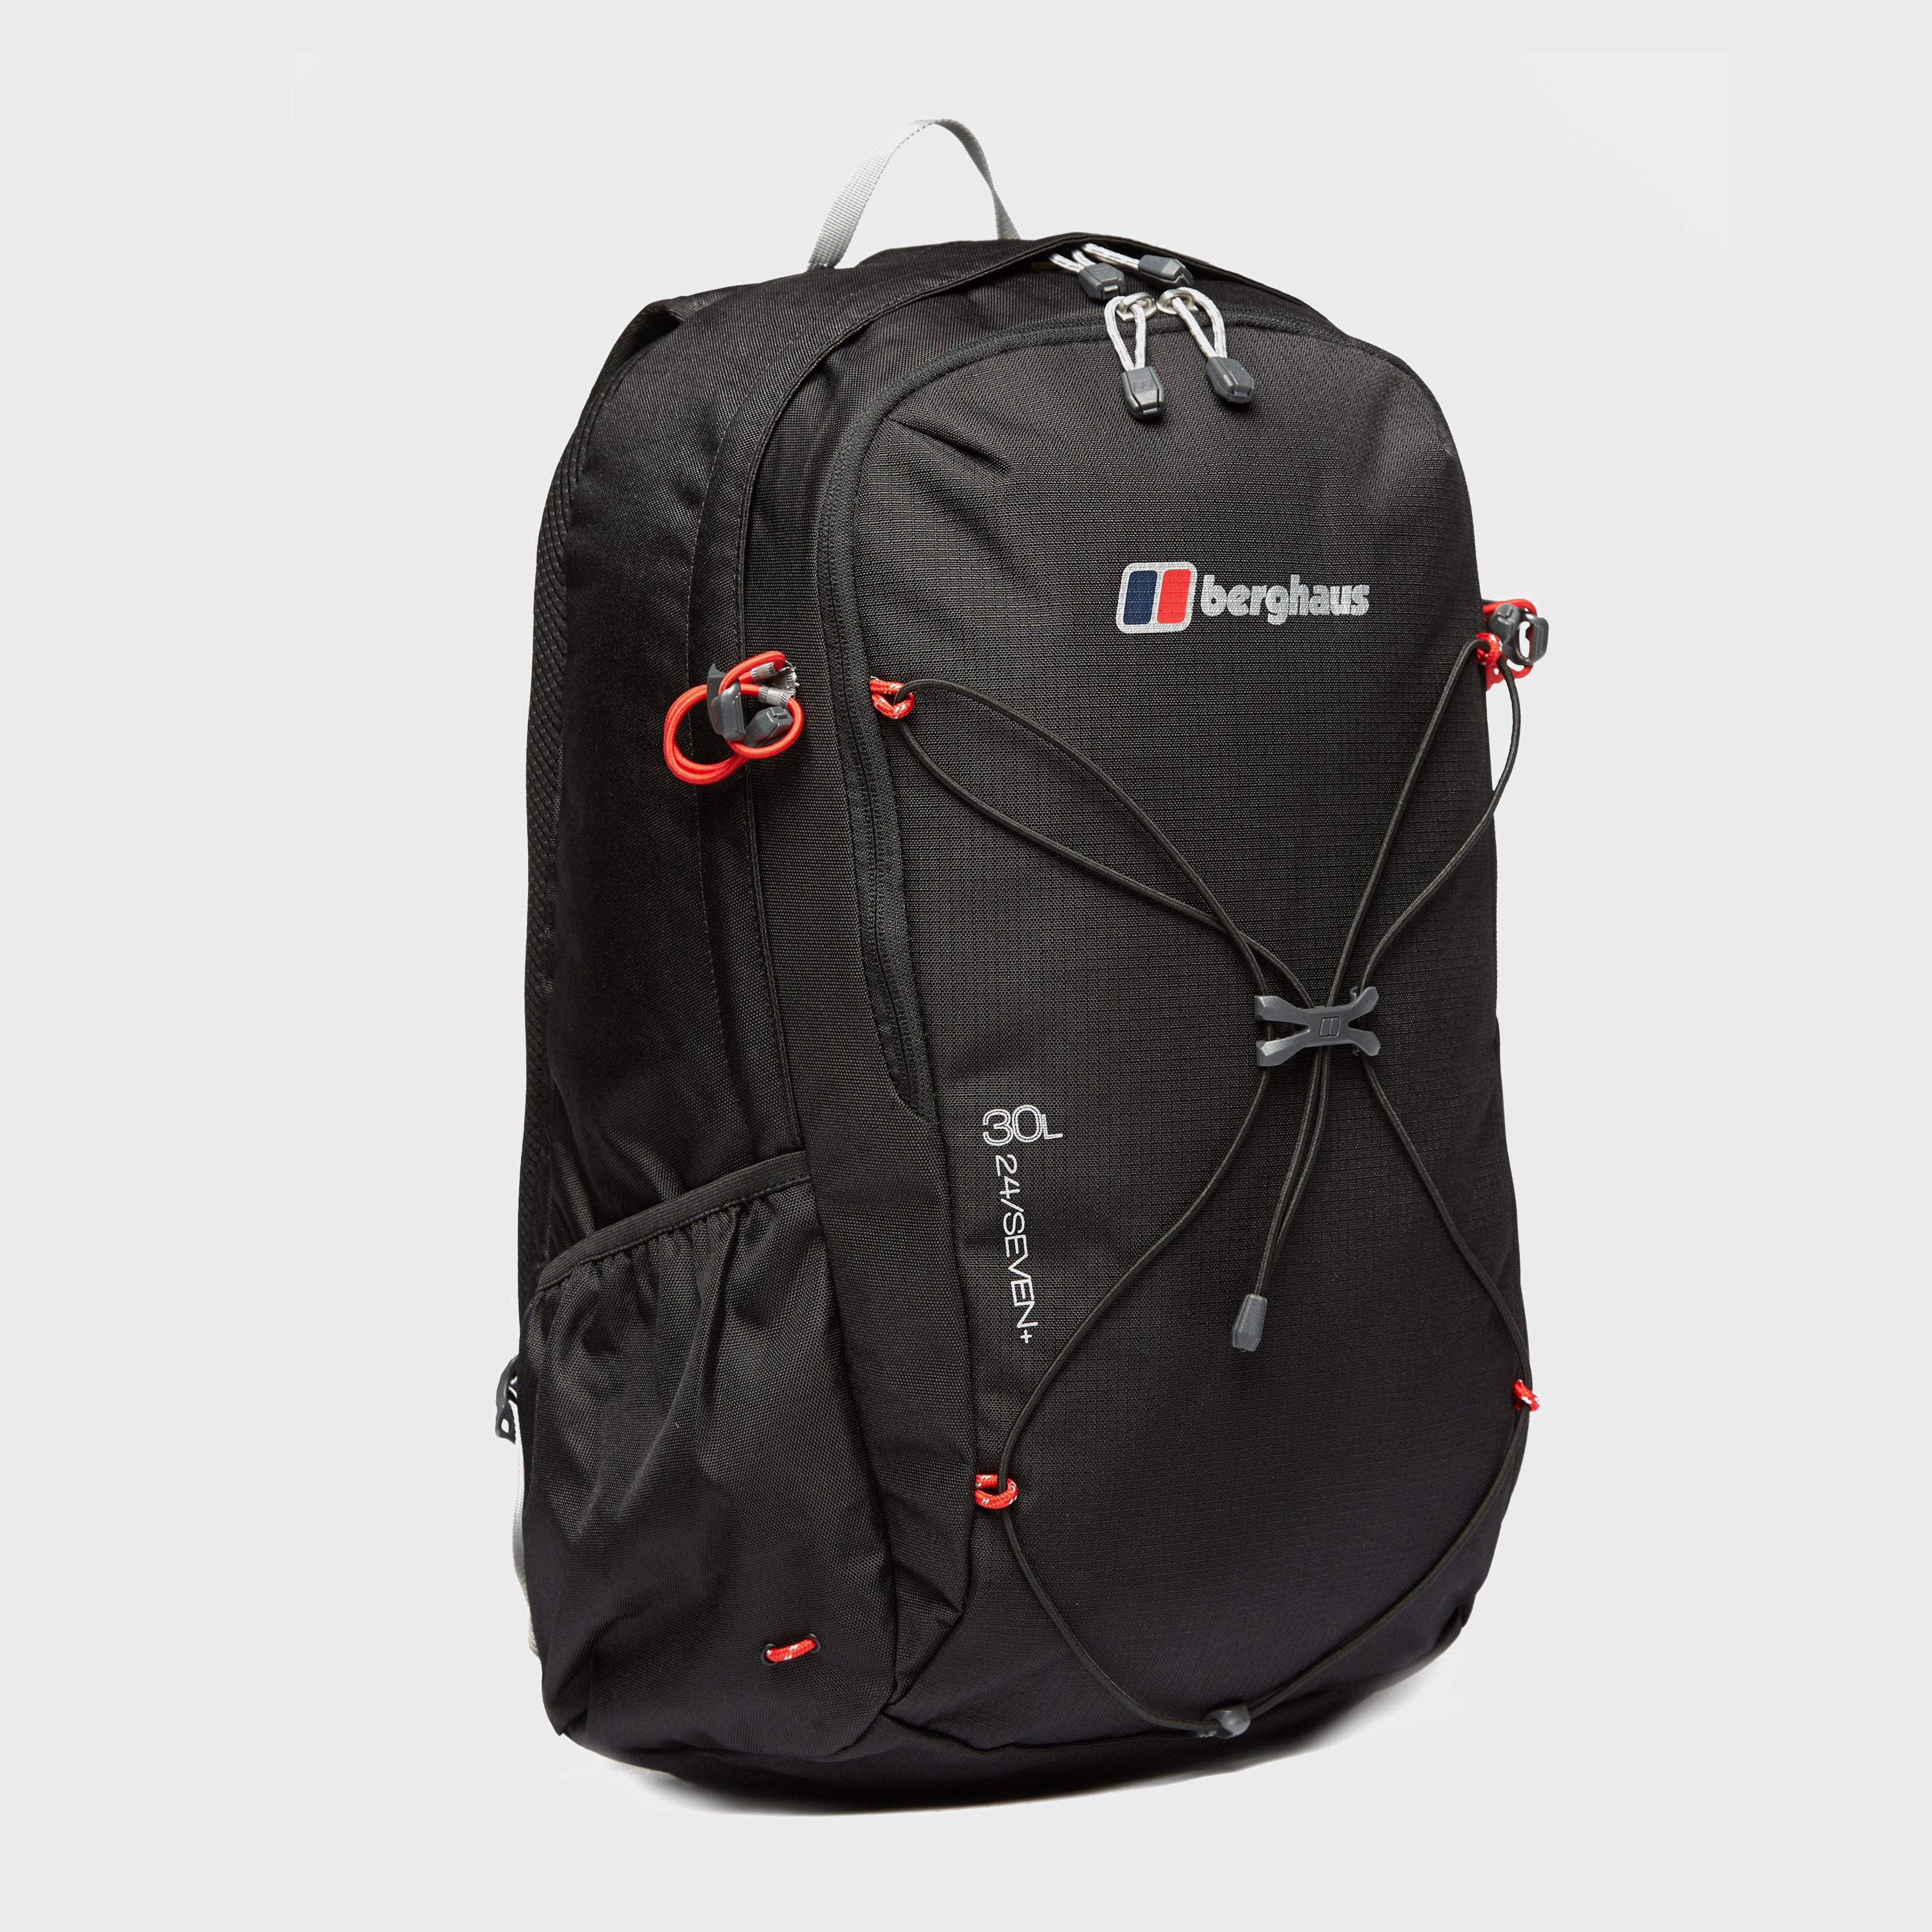 Berghaus Twentyfourseven 30 Backpack - Black/black  Black/black